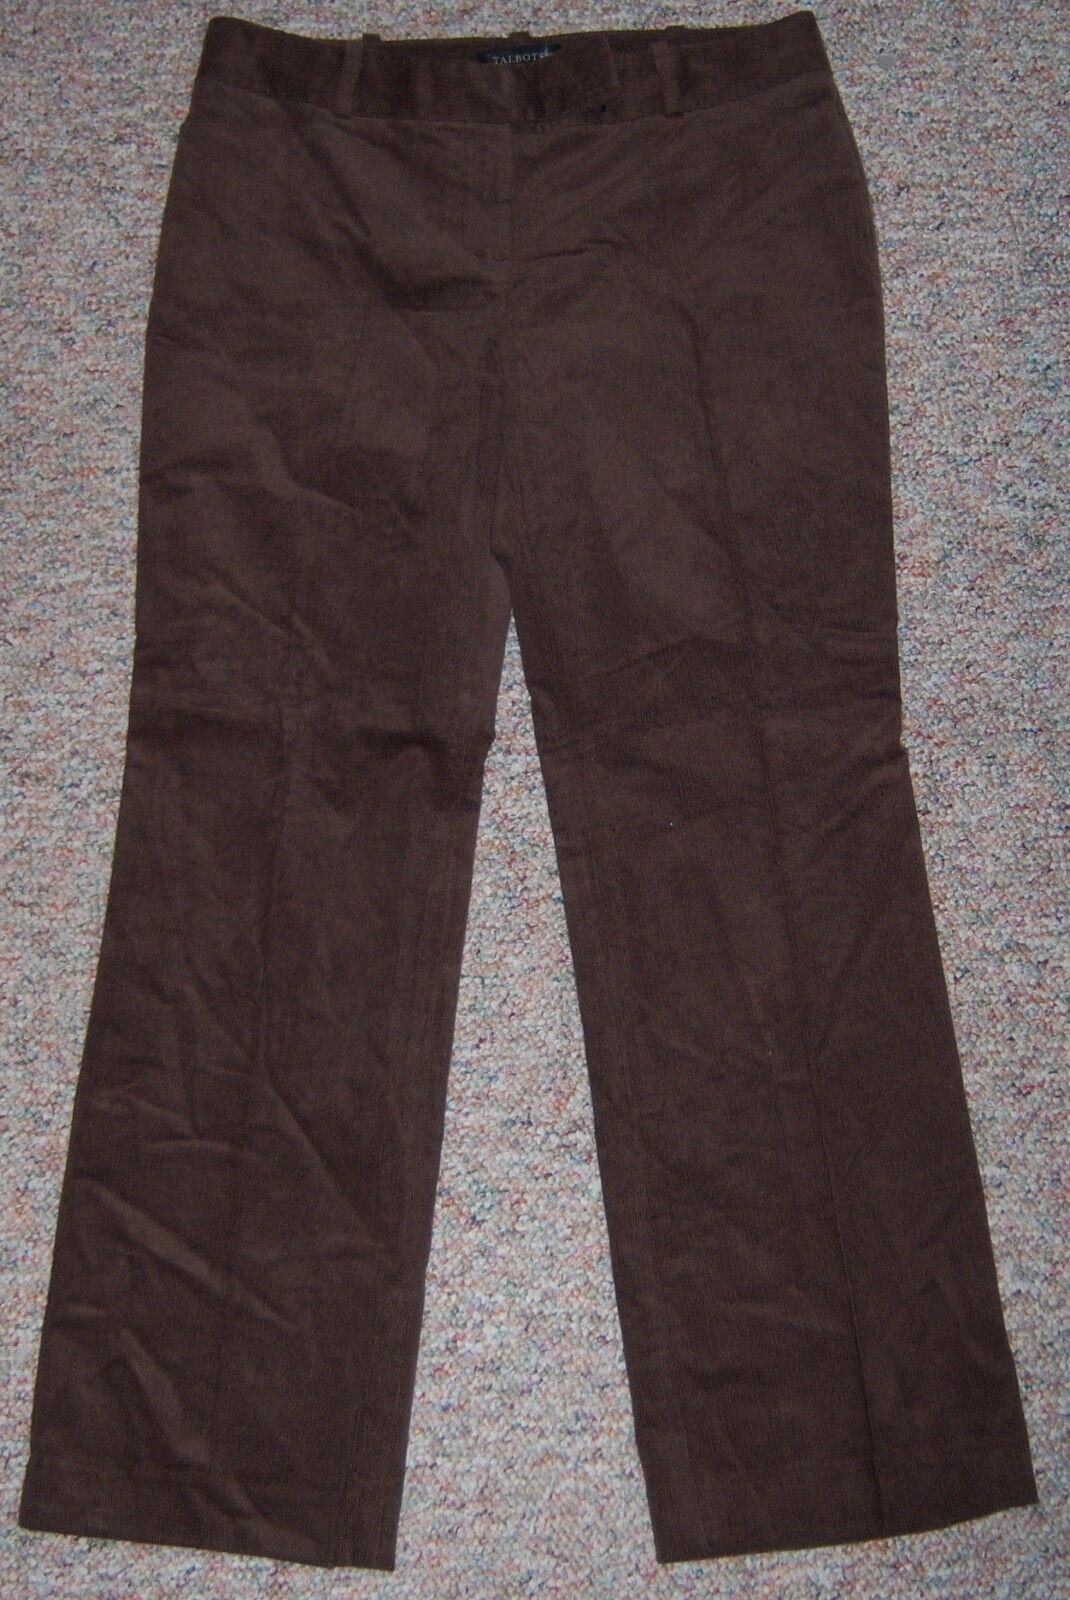 TALBOTS Dark Brown Signature Wide Leg Corduroy Pants Inseam 29  Size 8P 8Petite